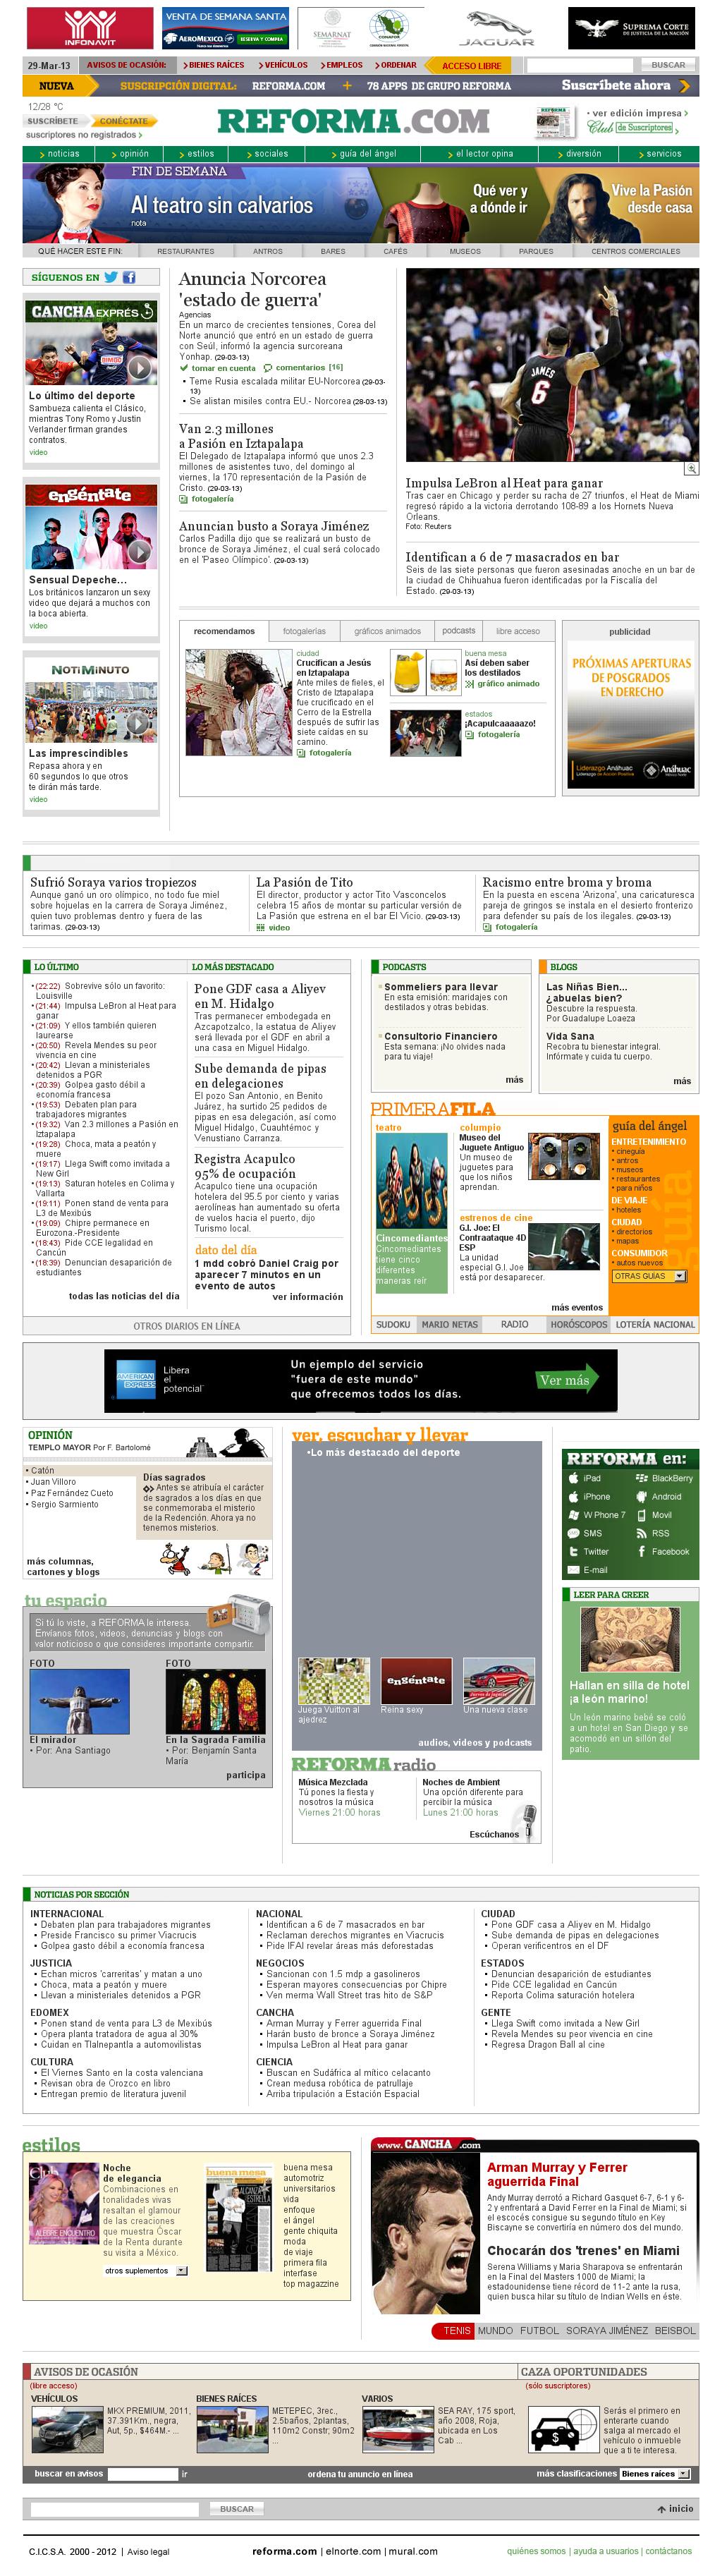 Reforma.com at Saturday March 30, 2013, 5:30 a.m. UTC